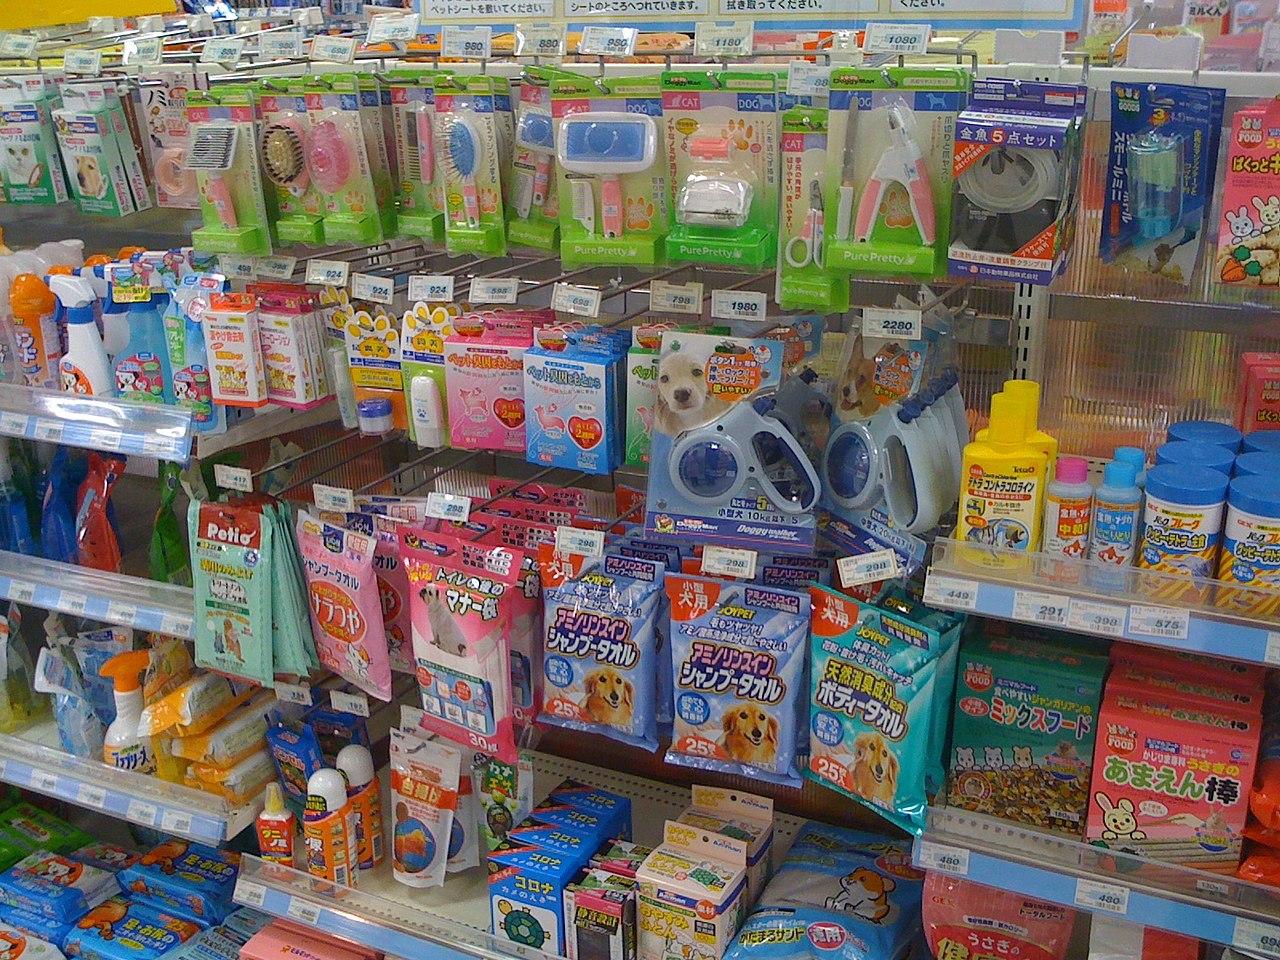 File:Pet shop in Chetosepia supermarket - panoramio jpg